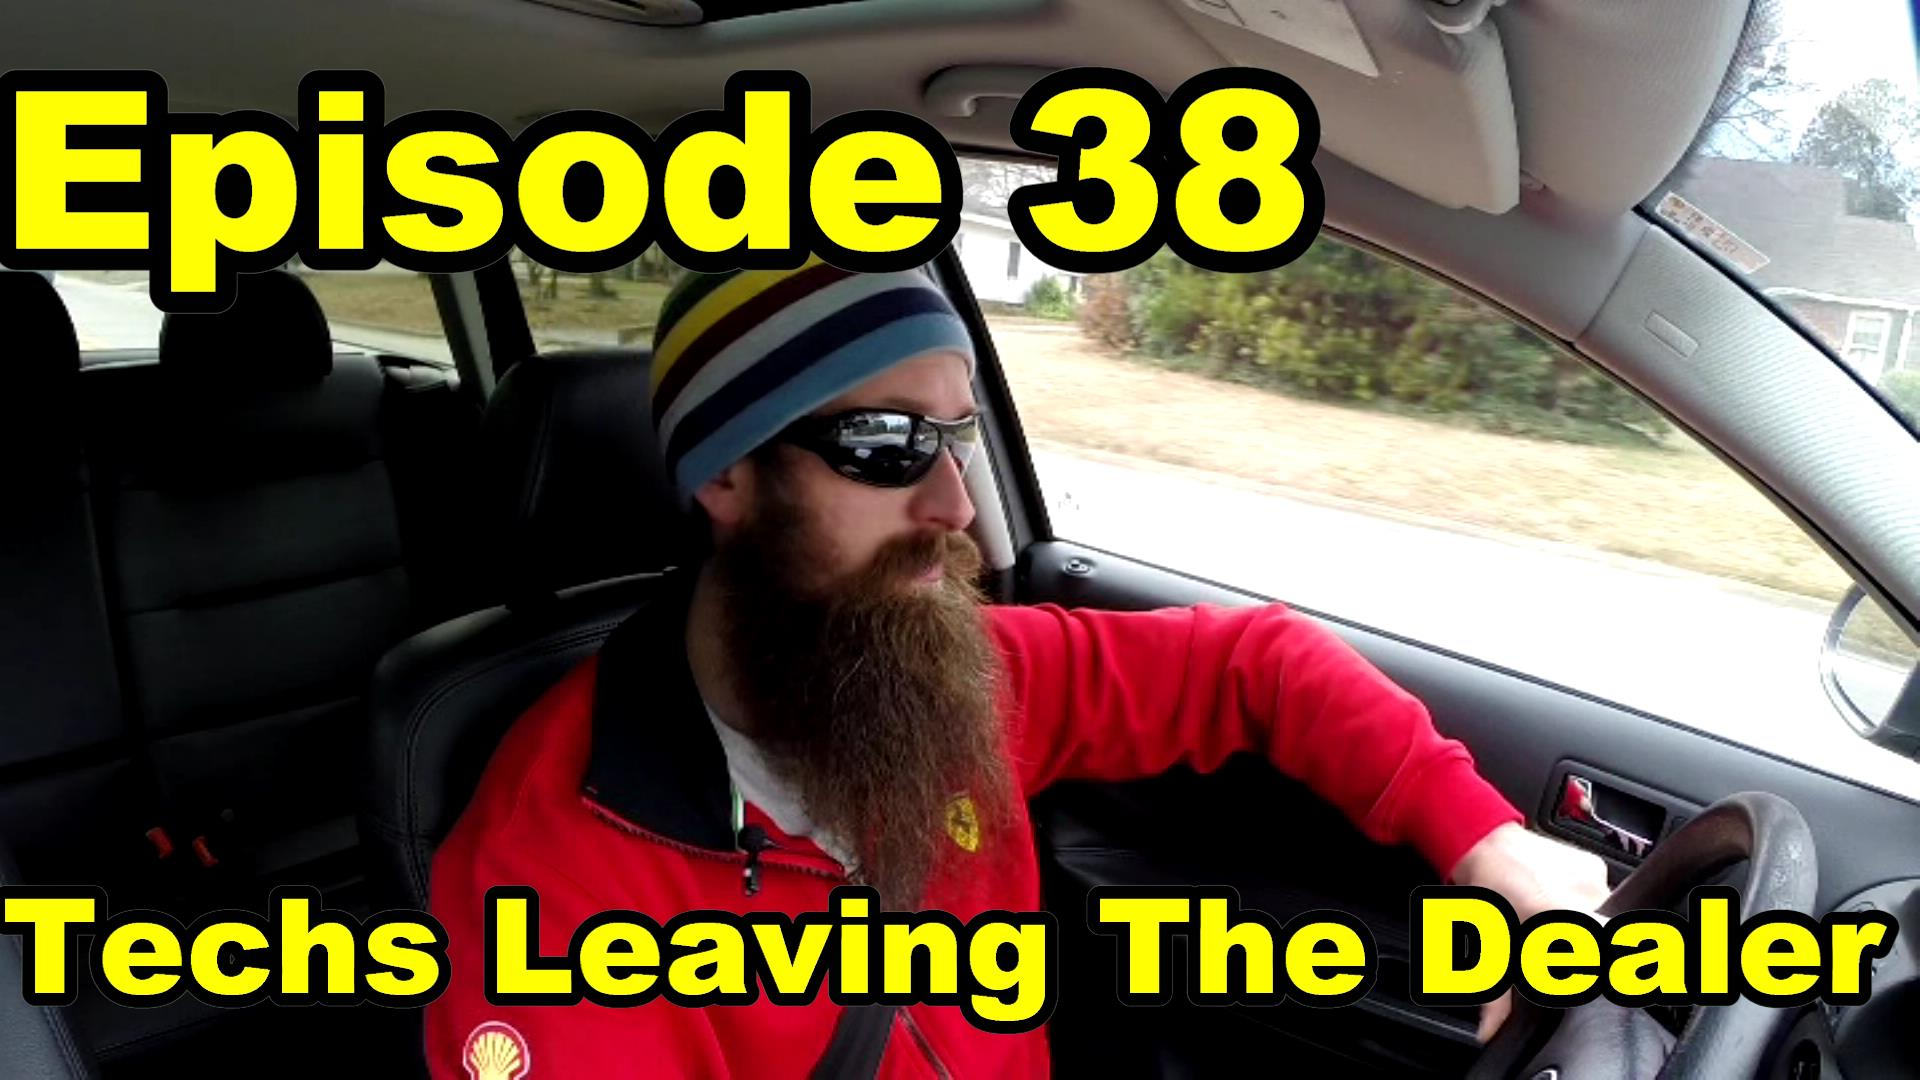 techs leaving dealers episode 38